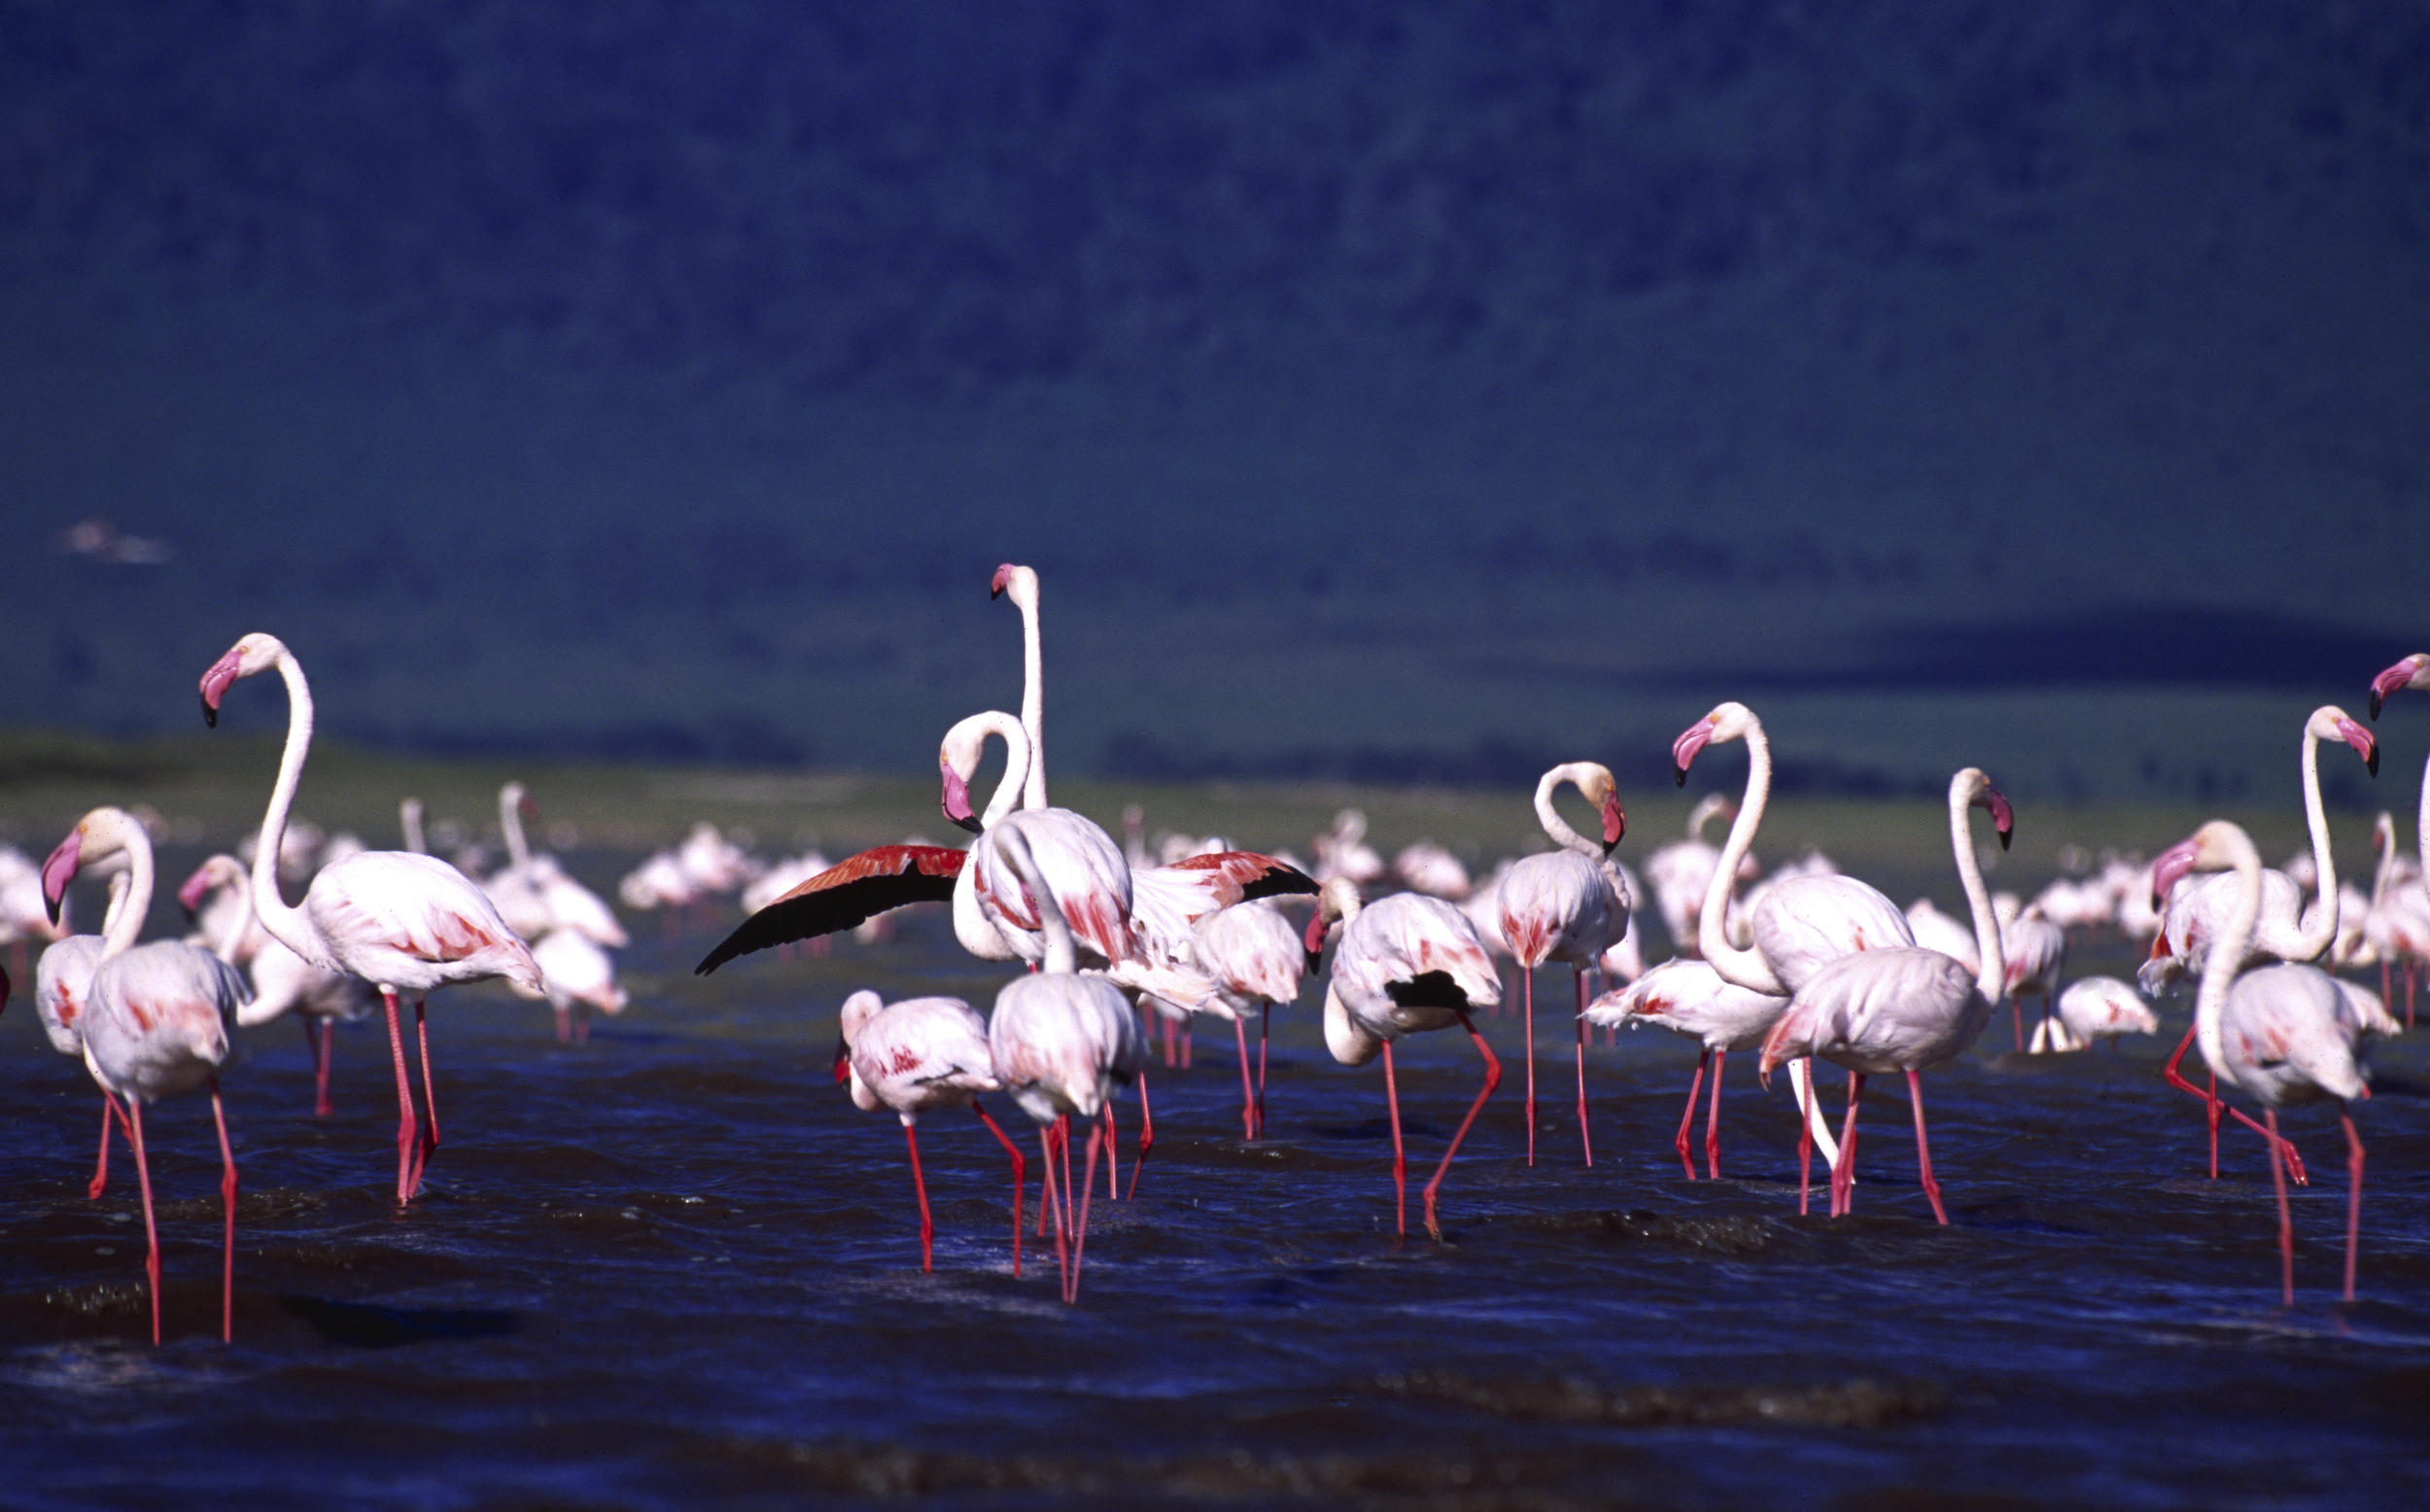 B009 - Flamingos.jpg